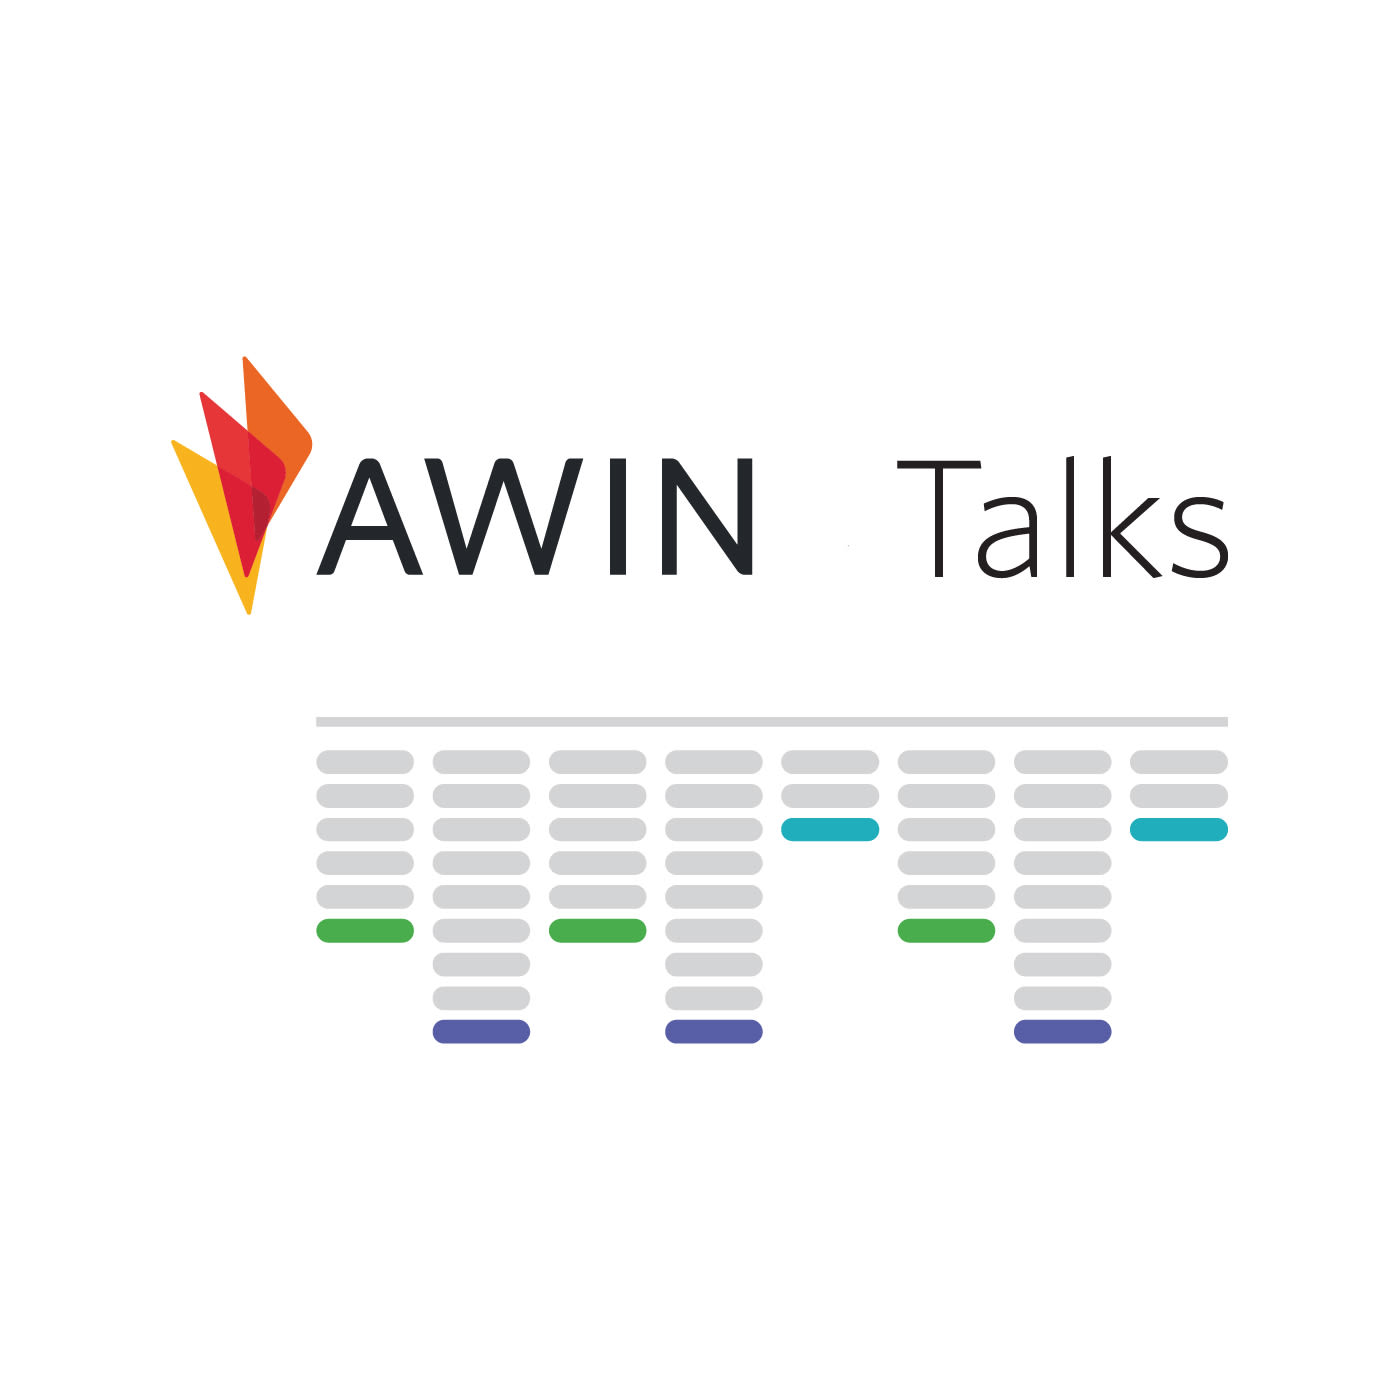 { secure_url: 'https://res.cloudinary.com/awin/image/upload/v1526381325/awin-website/market-insight-posts/thumbnail/fuqjbozrkd8ae1nvnn4x.jpg',   url: 'http://res.cloudinary.com/awin/image/upload/v1526381325/awin-website/market-insight-posts/thumbnail/fuqjbozrkd8ae1nvnn4x.jpg',   resource_type: 'image',   format: 'jpg',   height: 1400,   width: 1400,   signature: '32fb024c83cf899d26f03eaaea32d9e4f54fc40d',   version: 1526381325,   public_id: 'awin-website/market-insight-posts/thumbnail/fuqjbozrkd8ae1nvnn4x' }